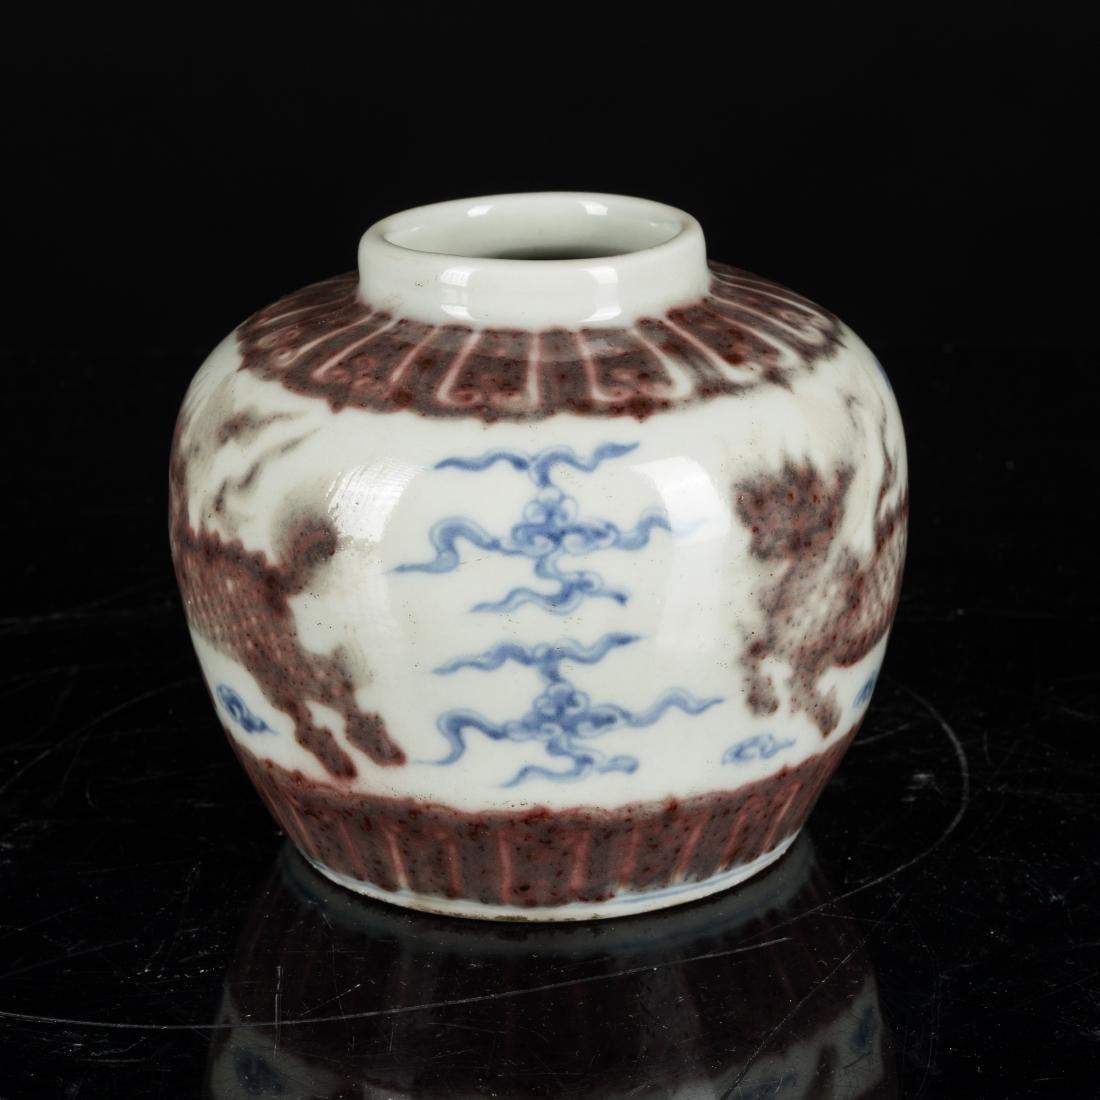 Late Ming Antique Porcelain Jar - 4